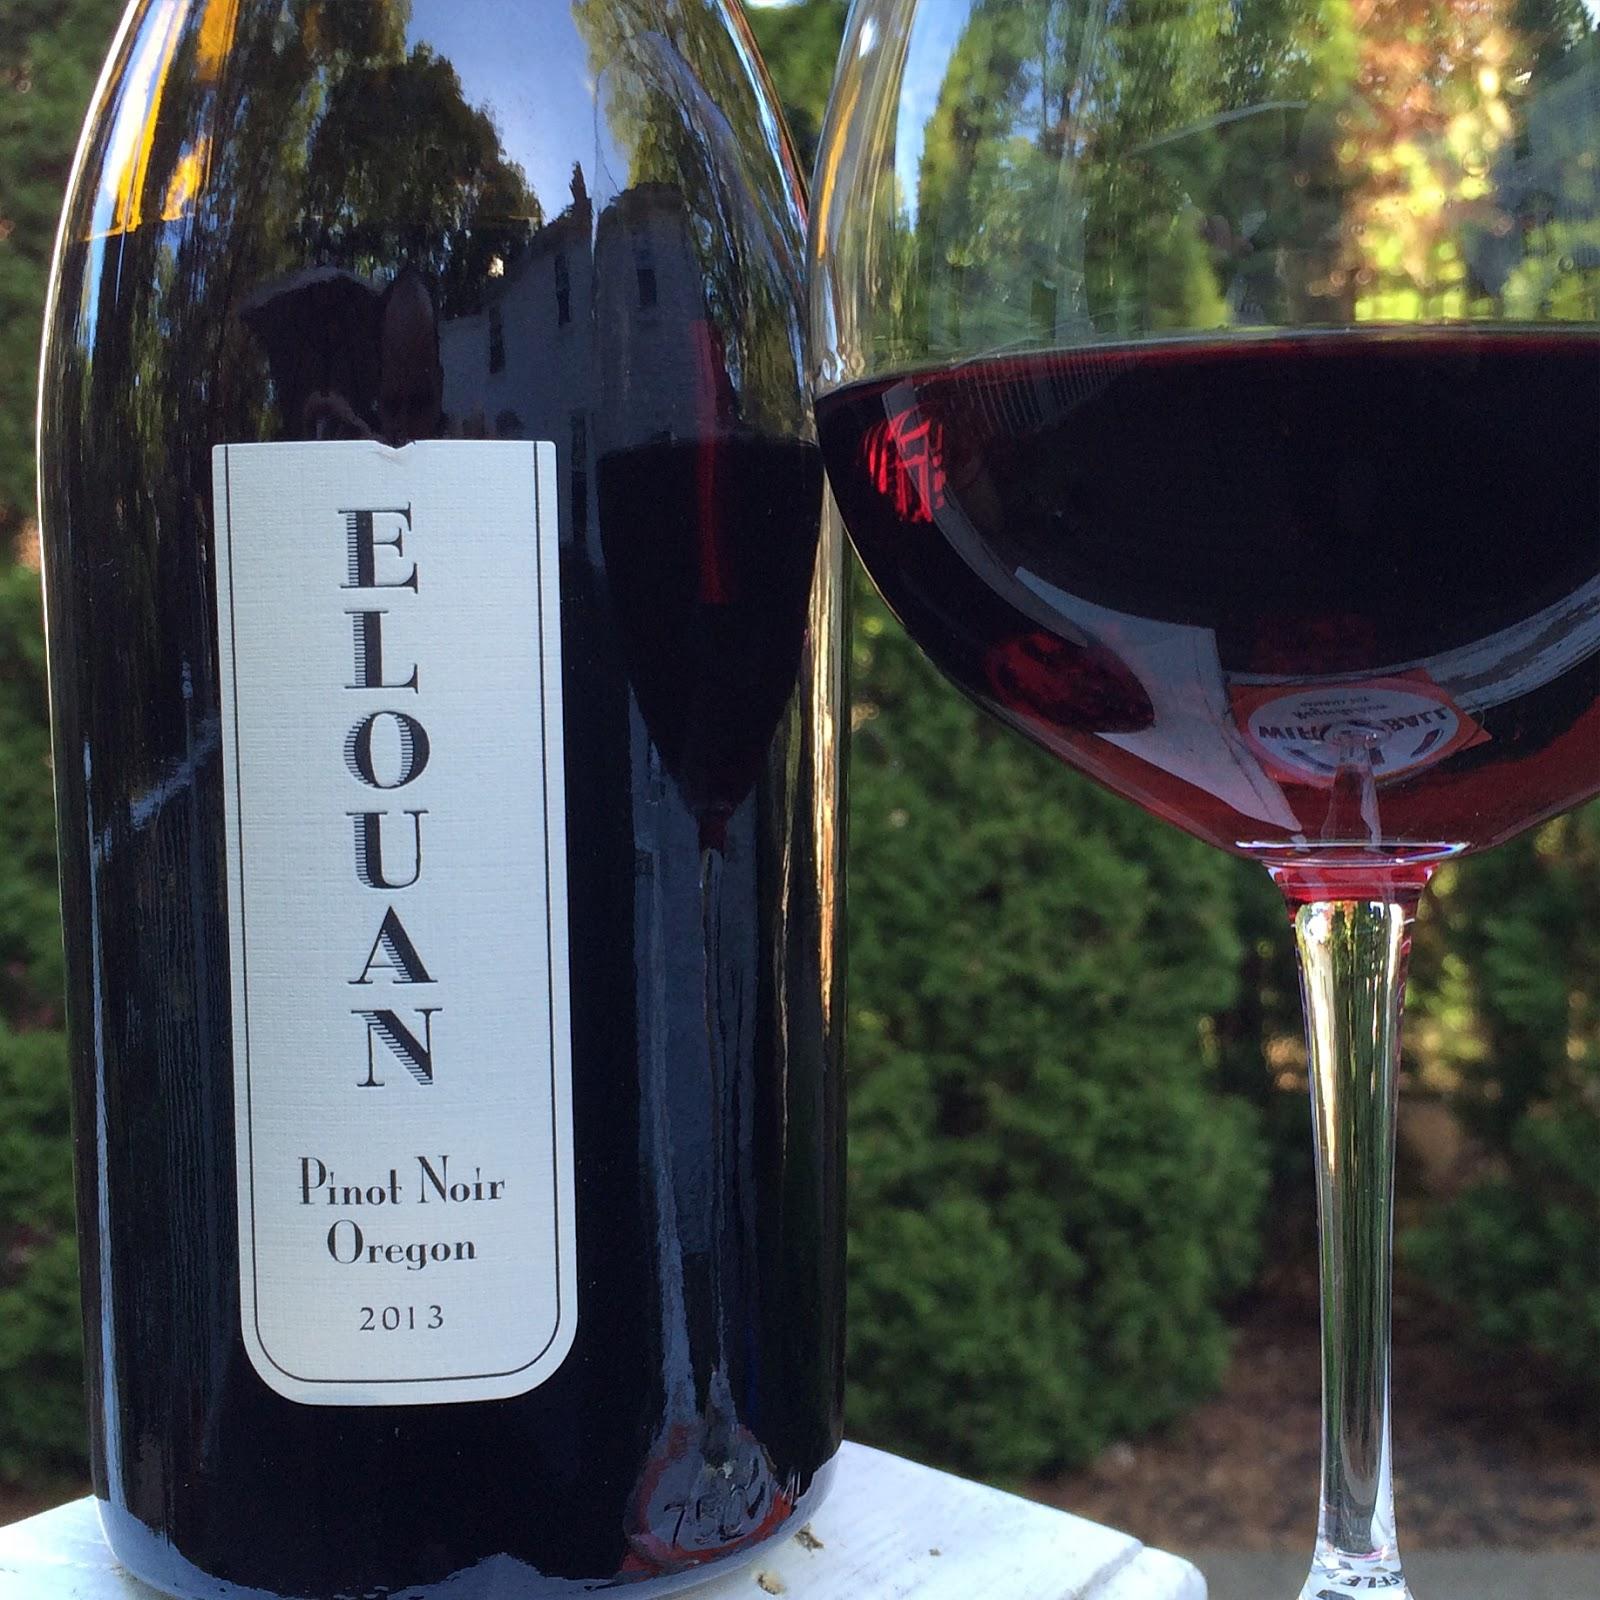 The Wellesley Wine Press: First Look: Elouan Oregon Pinot Noir